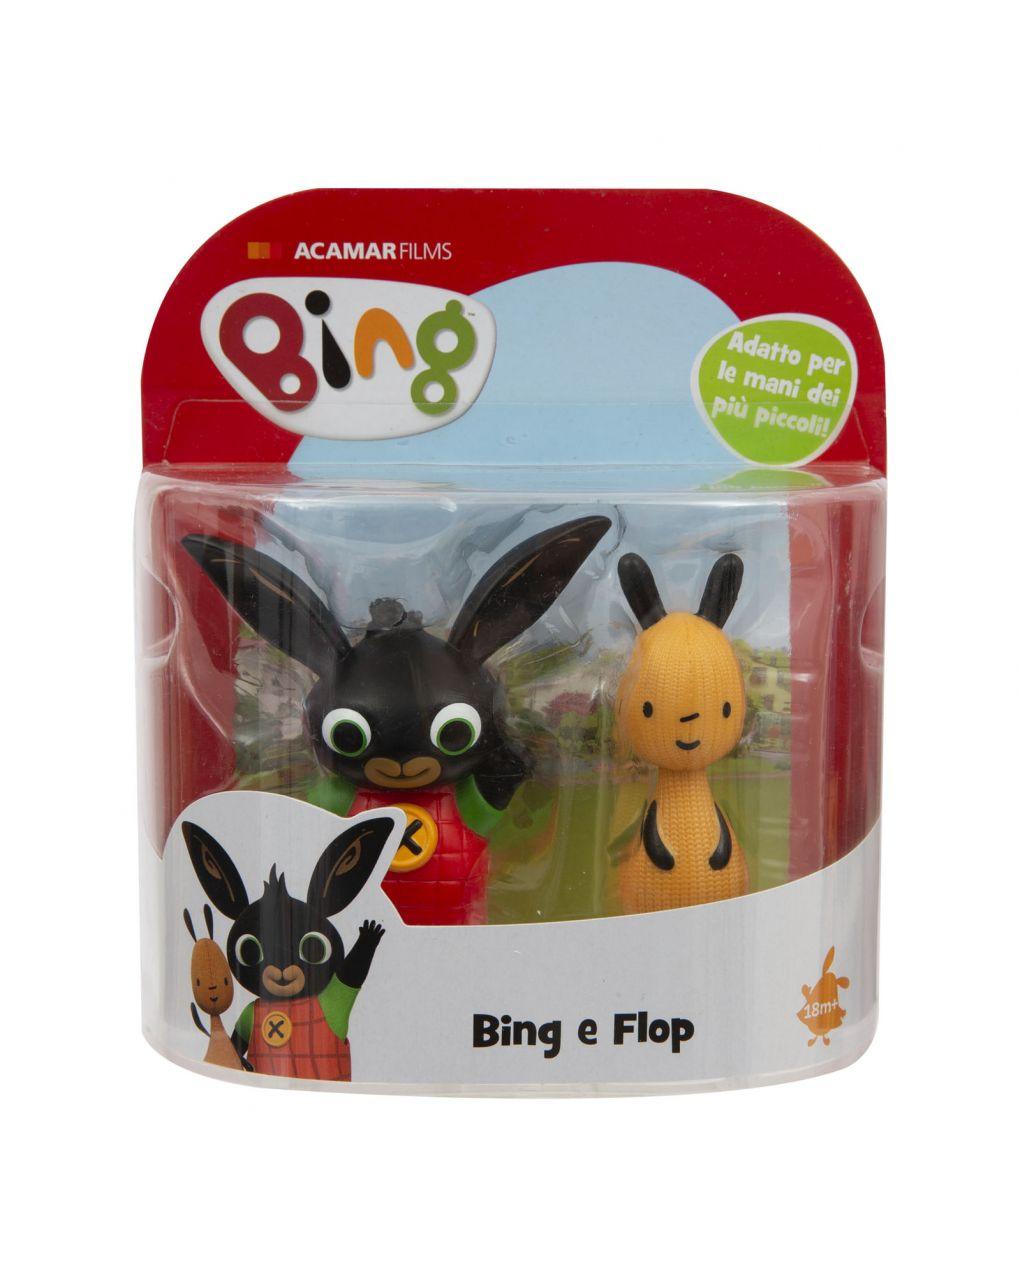 Personagens do casal bing acenam 2 - Bing